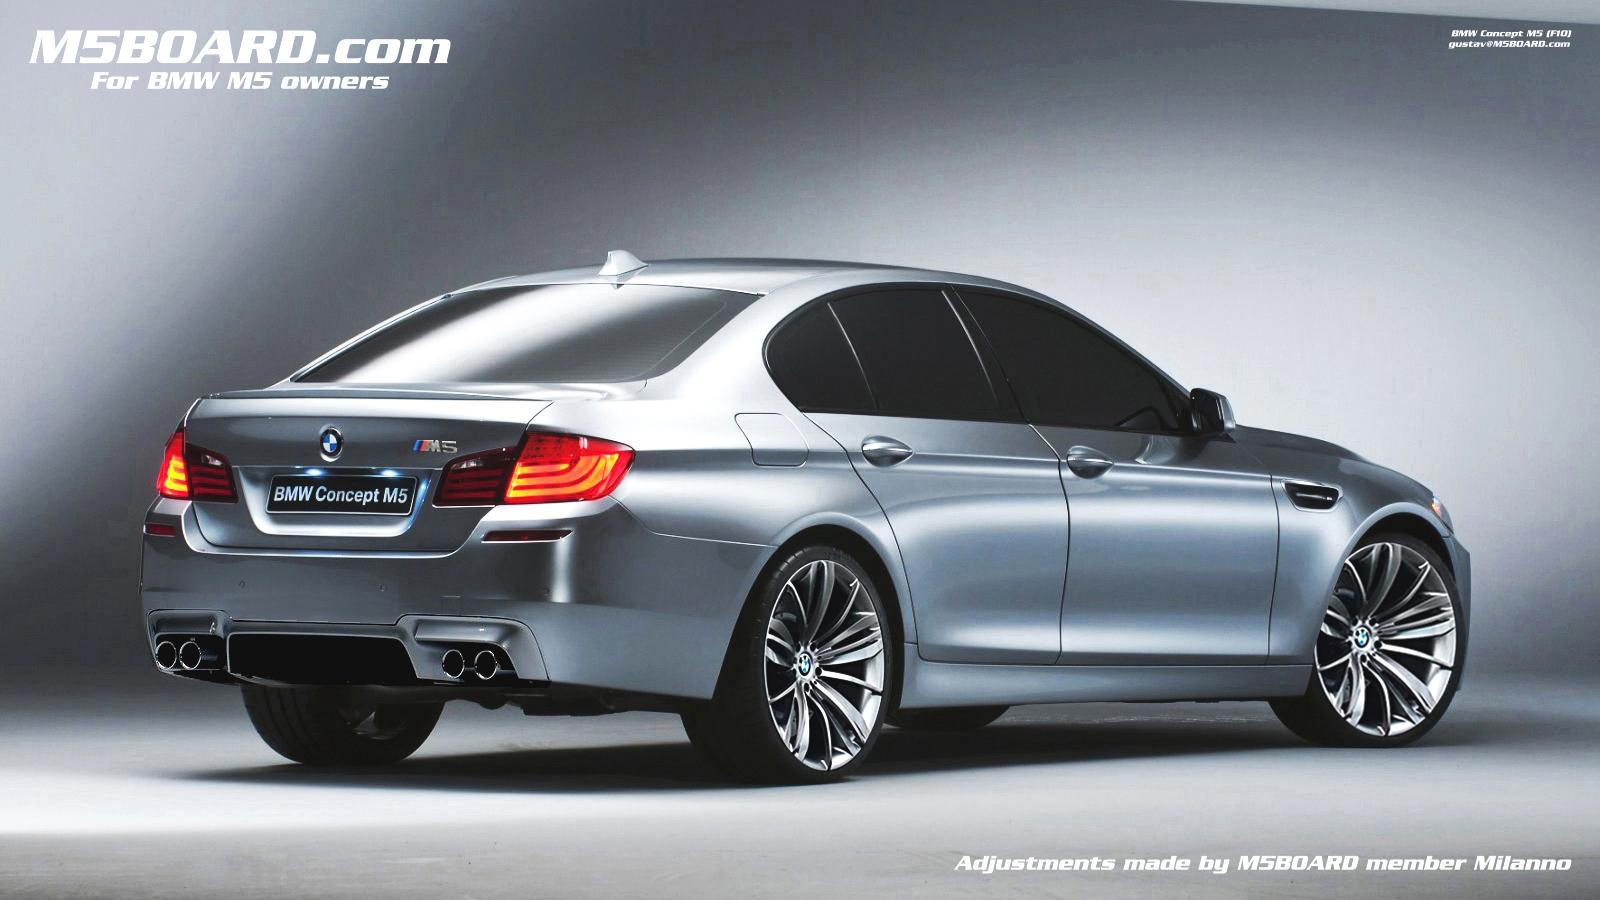 BMW M5 F10 Unveiling: revealed!-m5badge.jpg